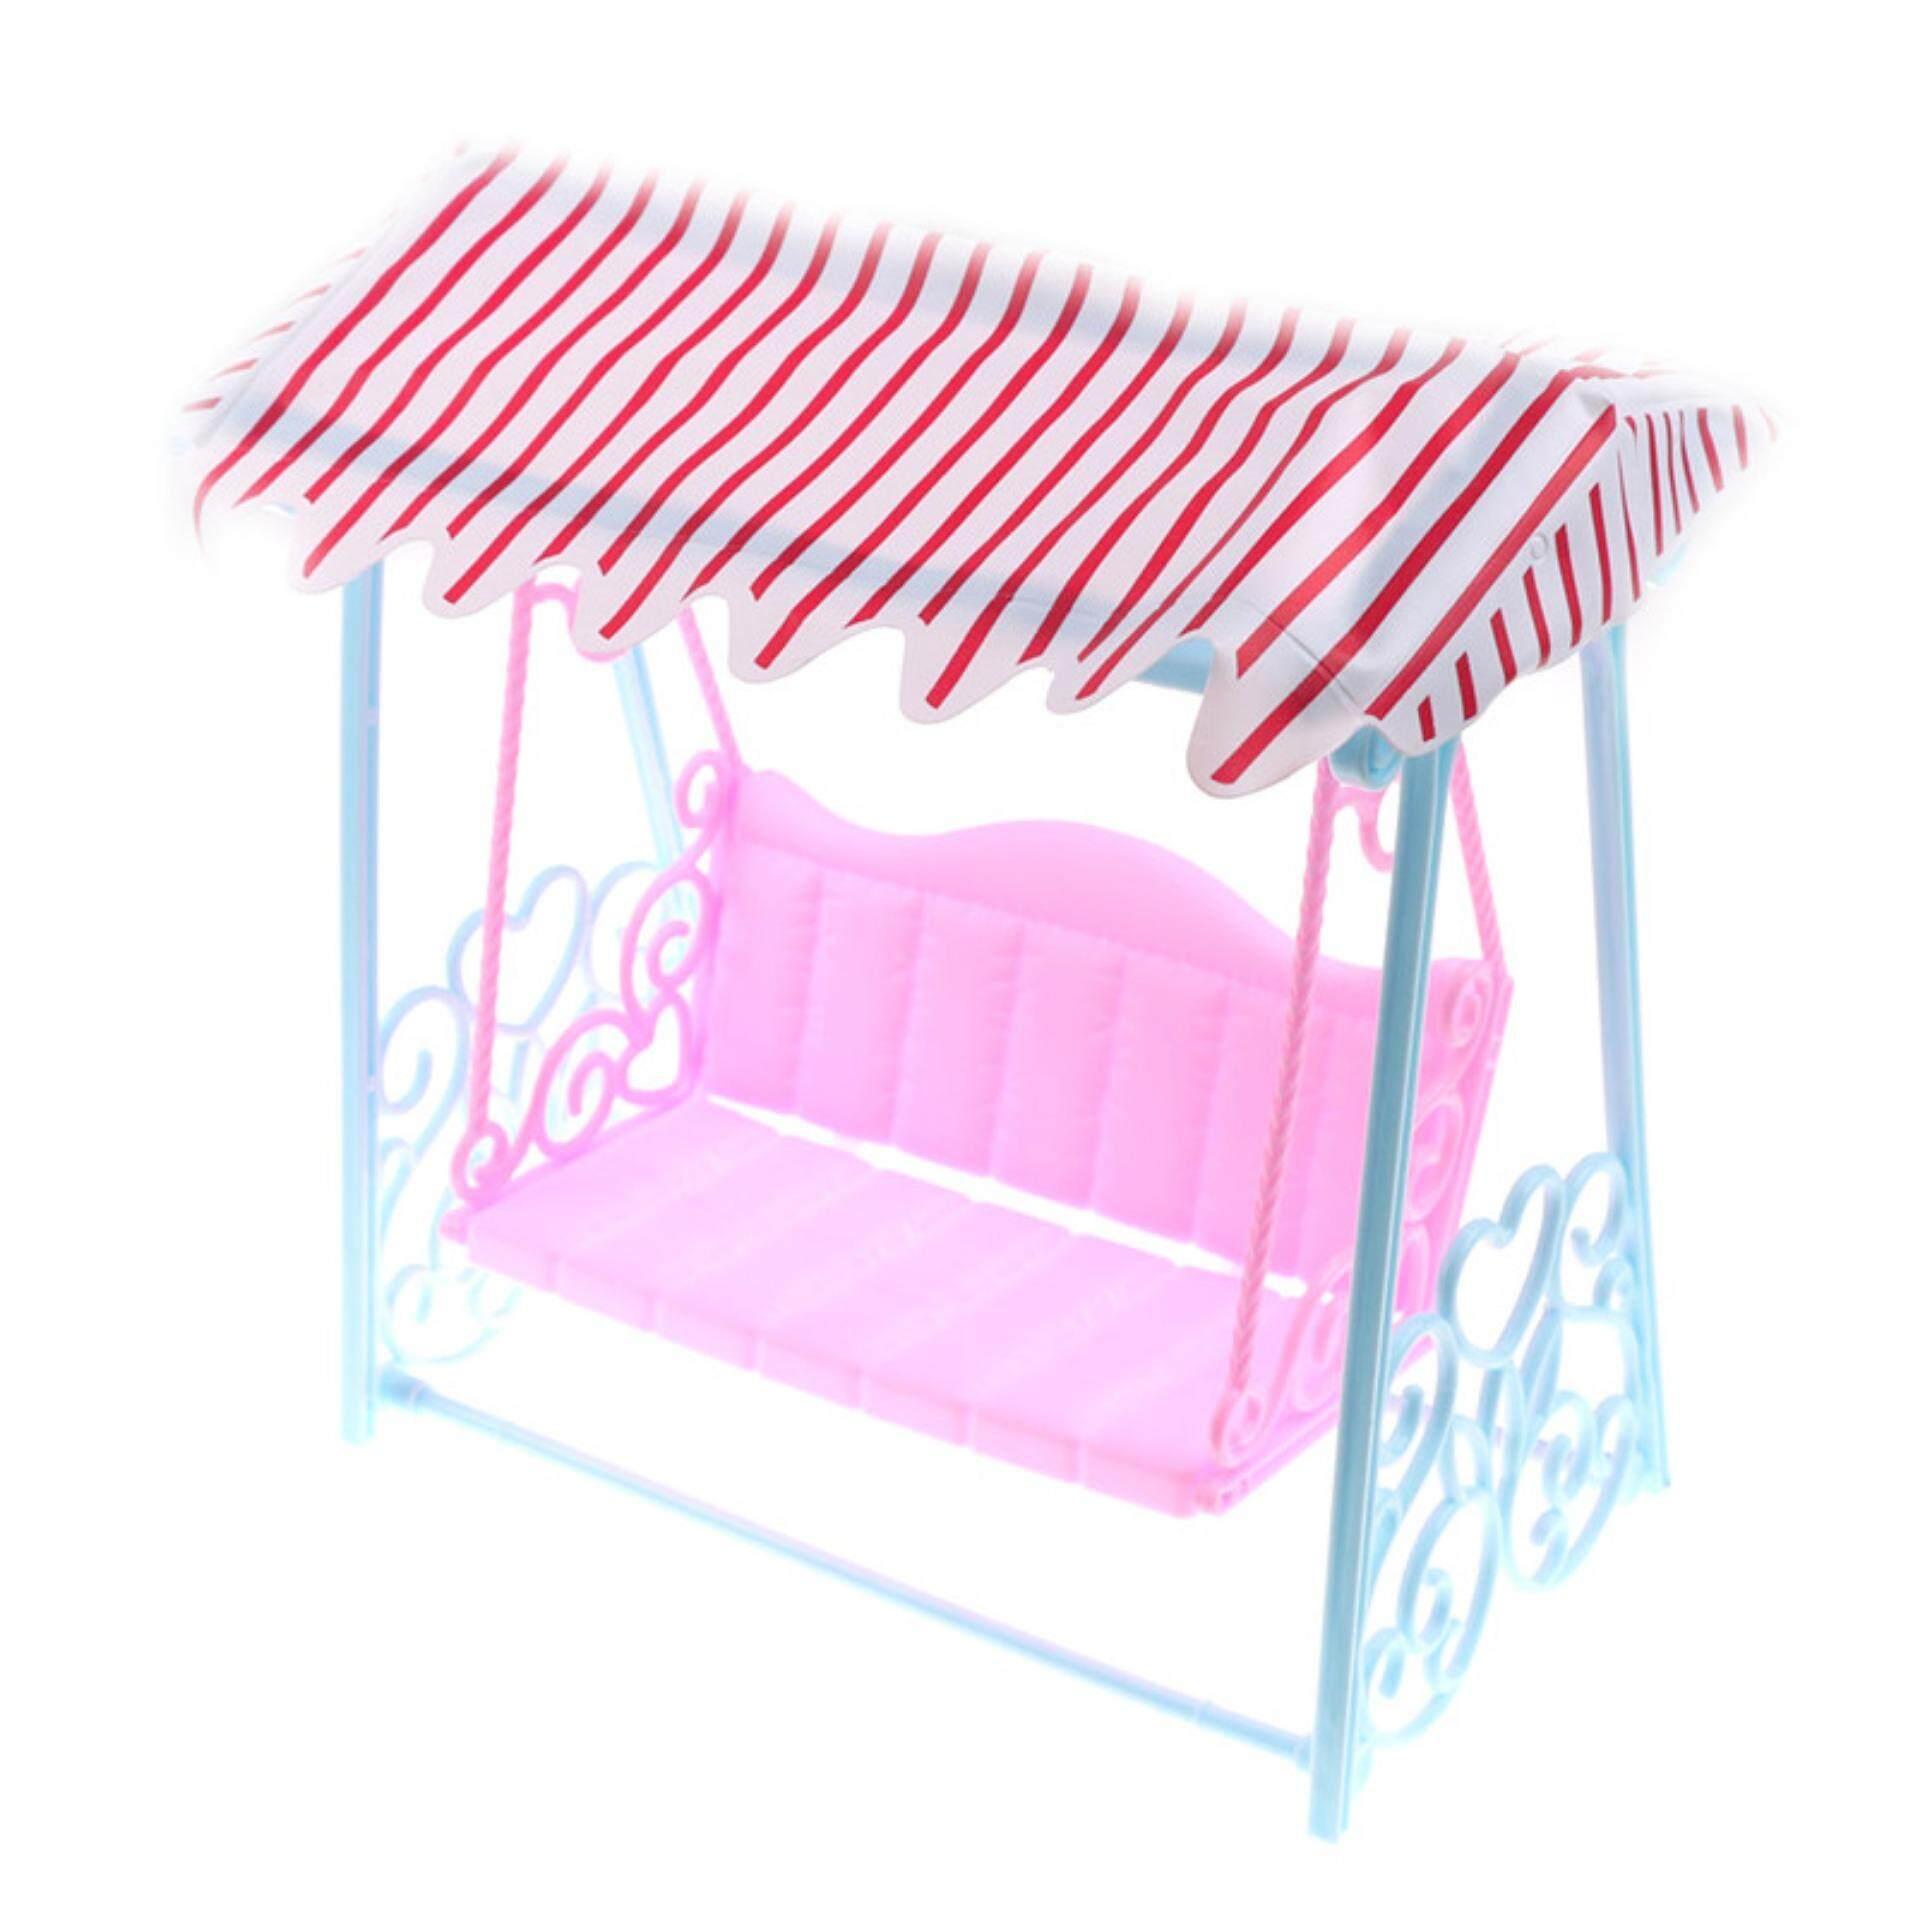 Detail Gambar Doll Toy Garden Swing Set For Barbie FR Kurhn Doll Play House  Accessories   Intl Terbaru